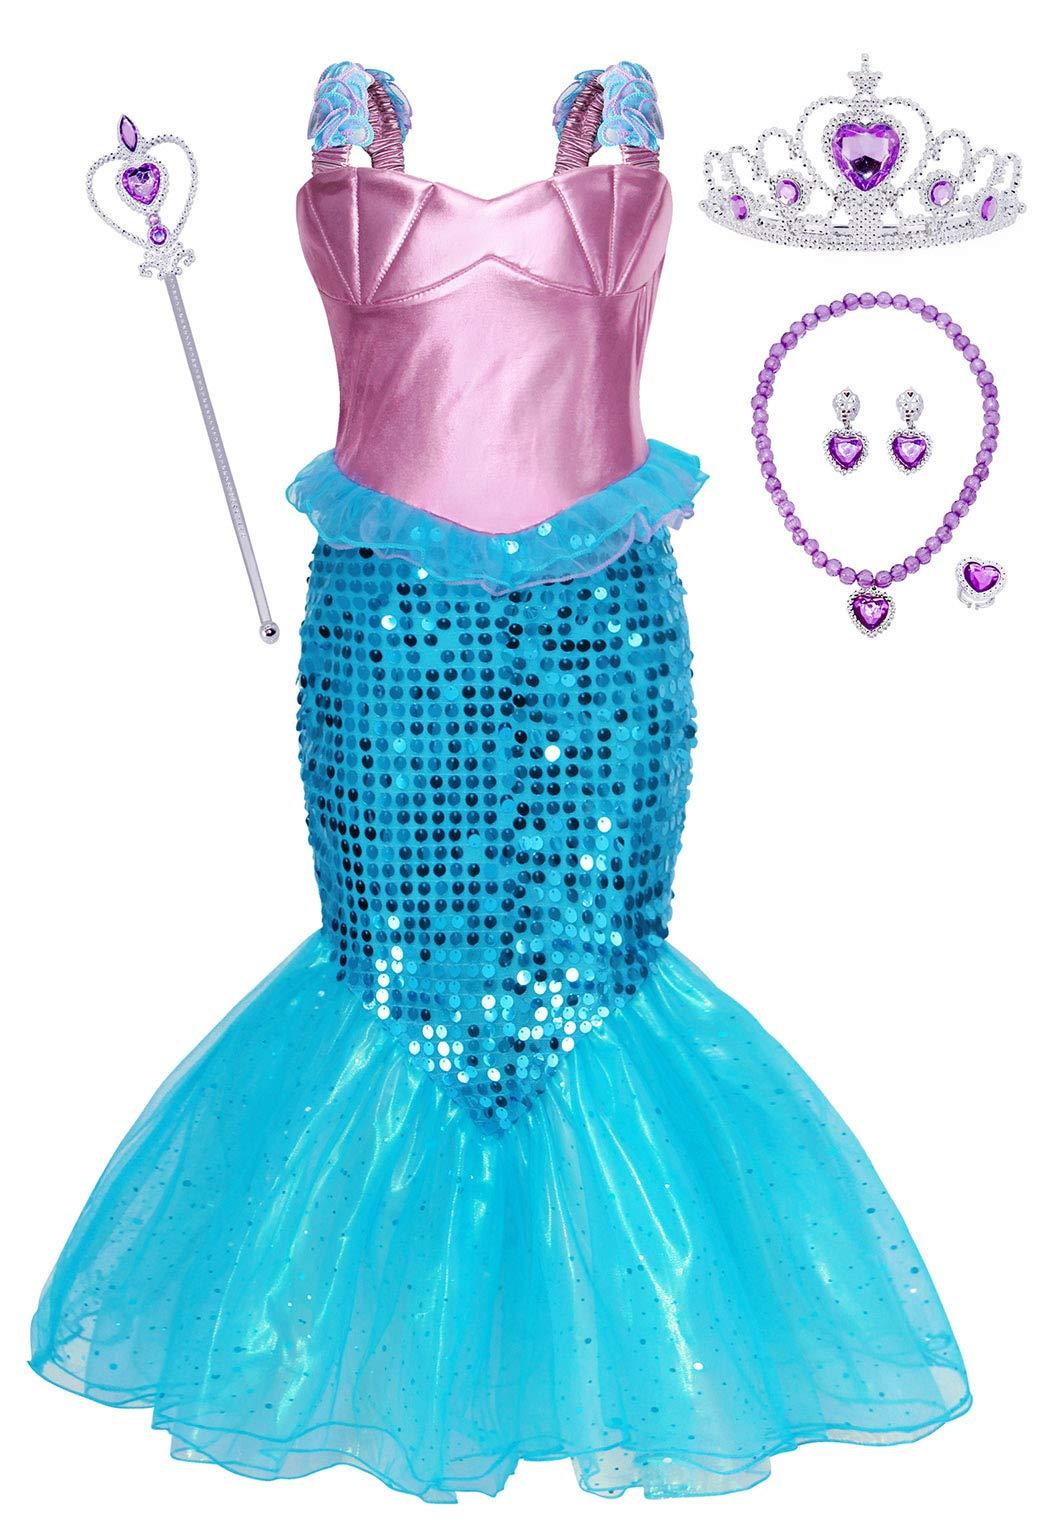 HenzWorld Mermaid Costume Princess Dress Birthday Party Cosplay Ruffle Shoulder Strap Headband Jewelry Accessory